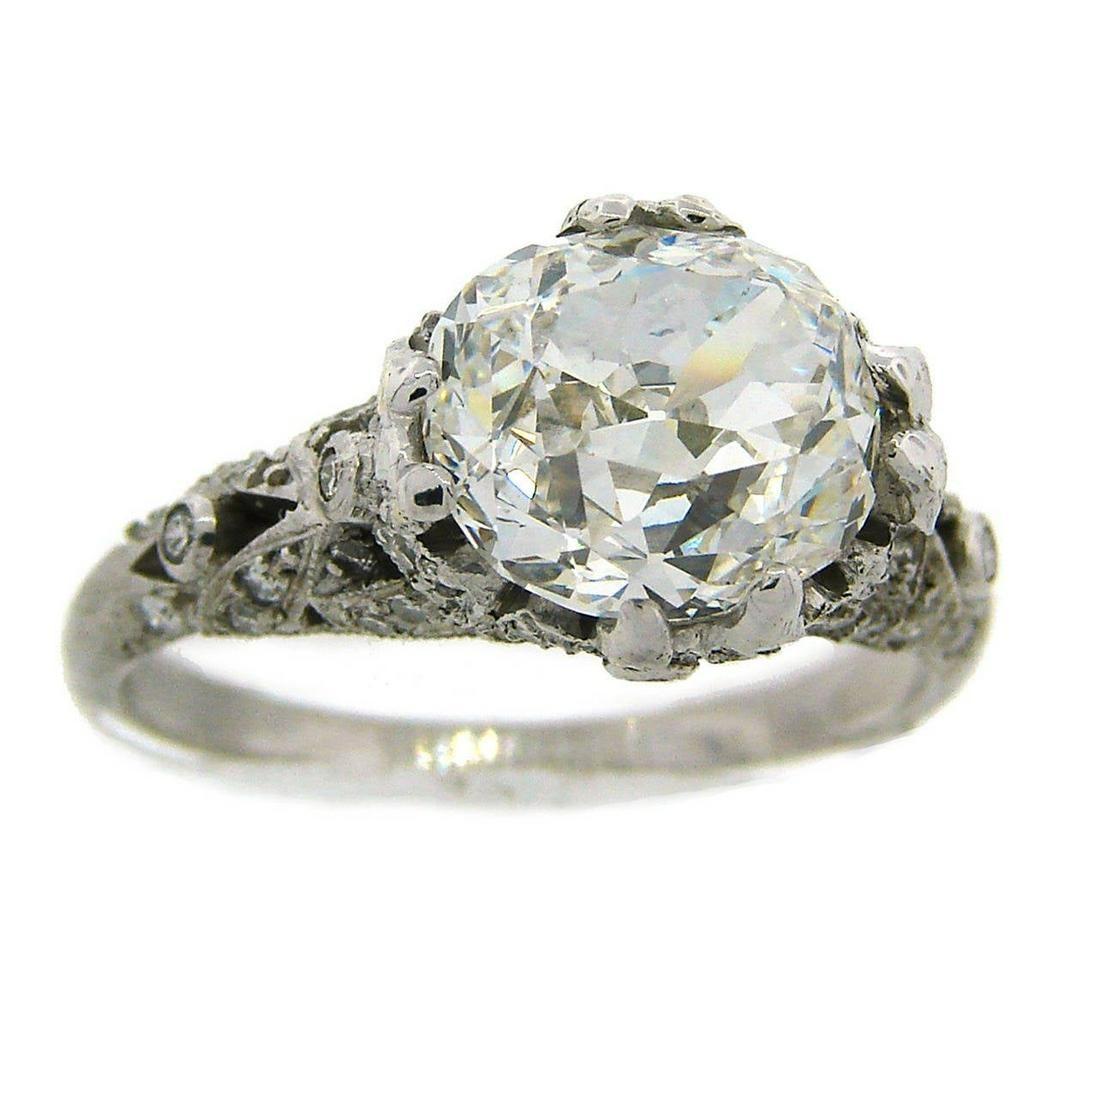 Cushion Cut Diamond Platinum Ring Art Deco circa 1920s